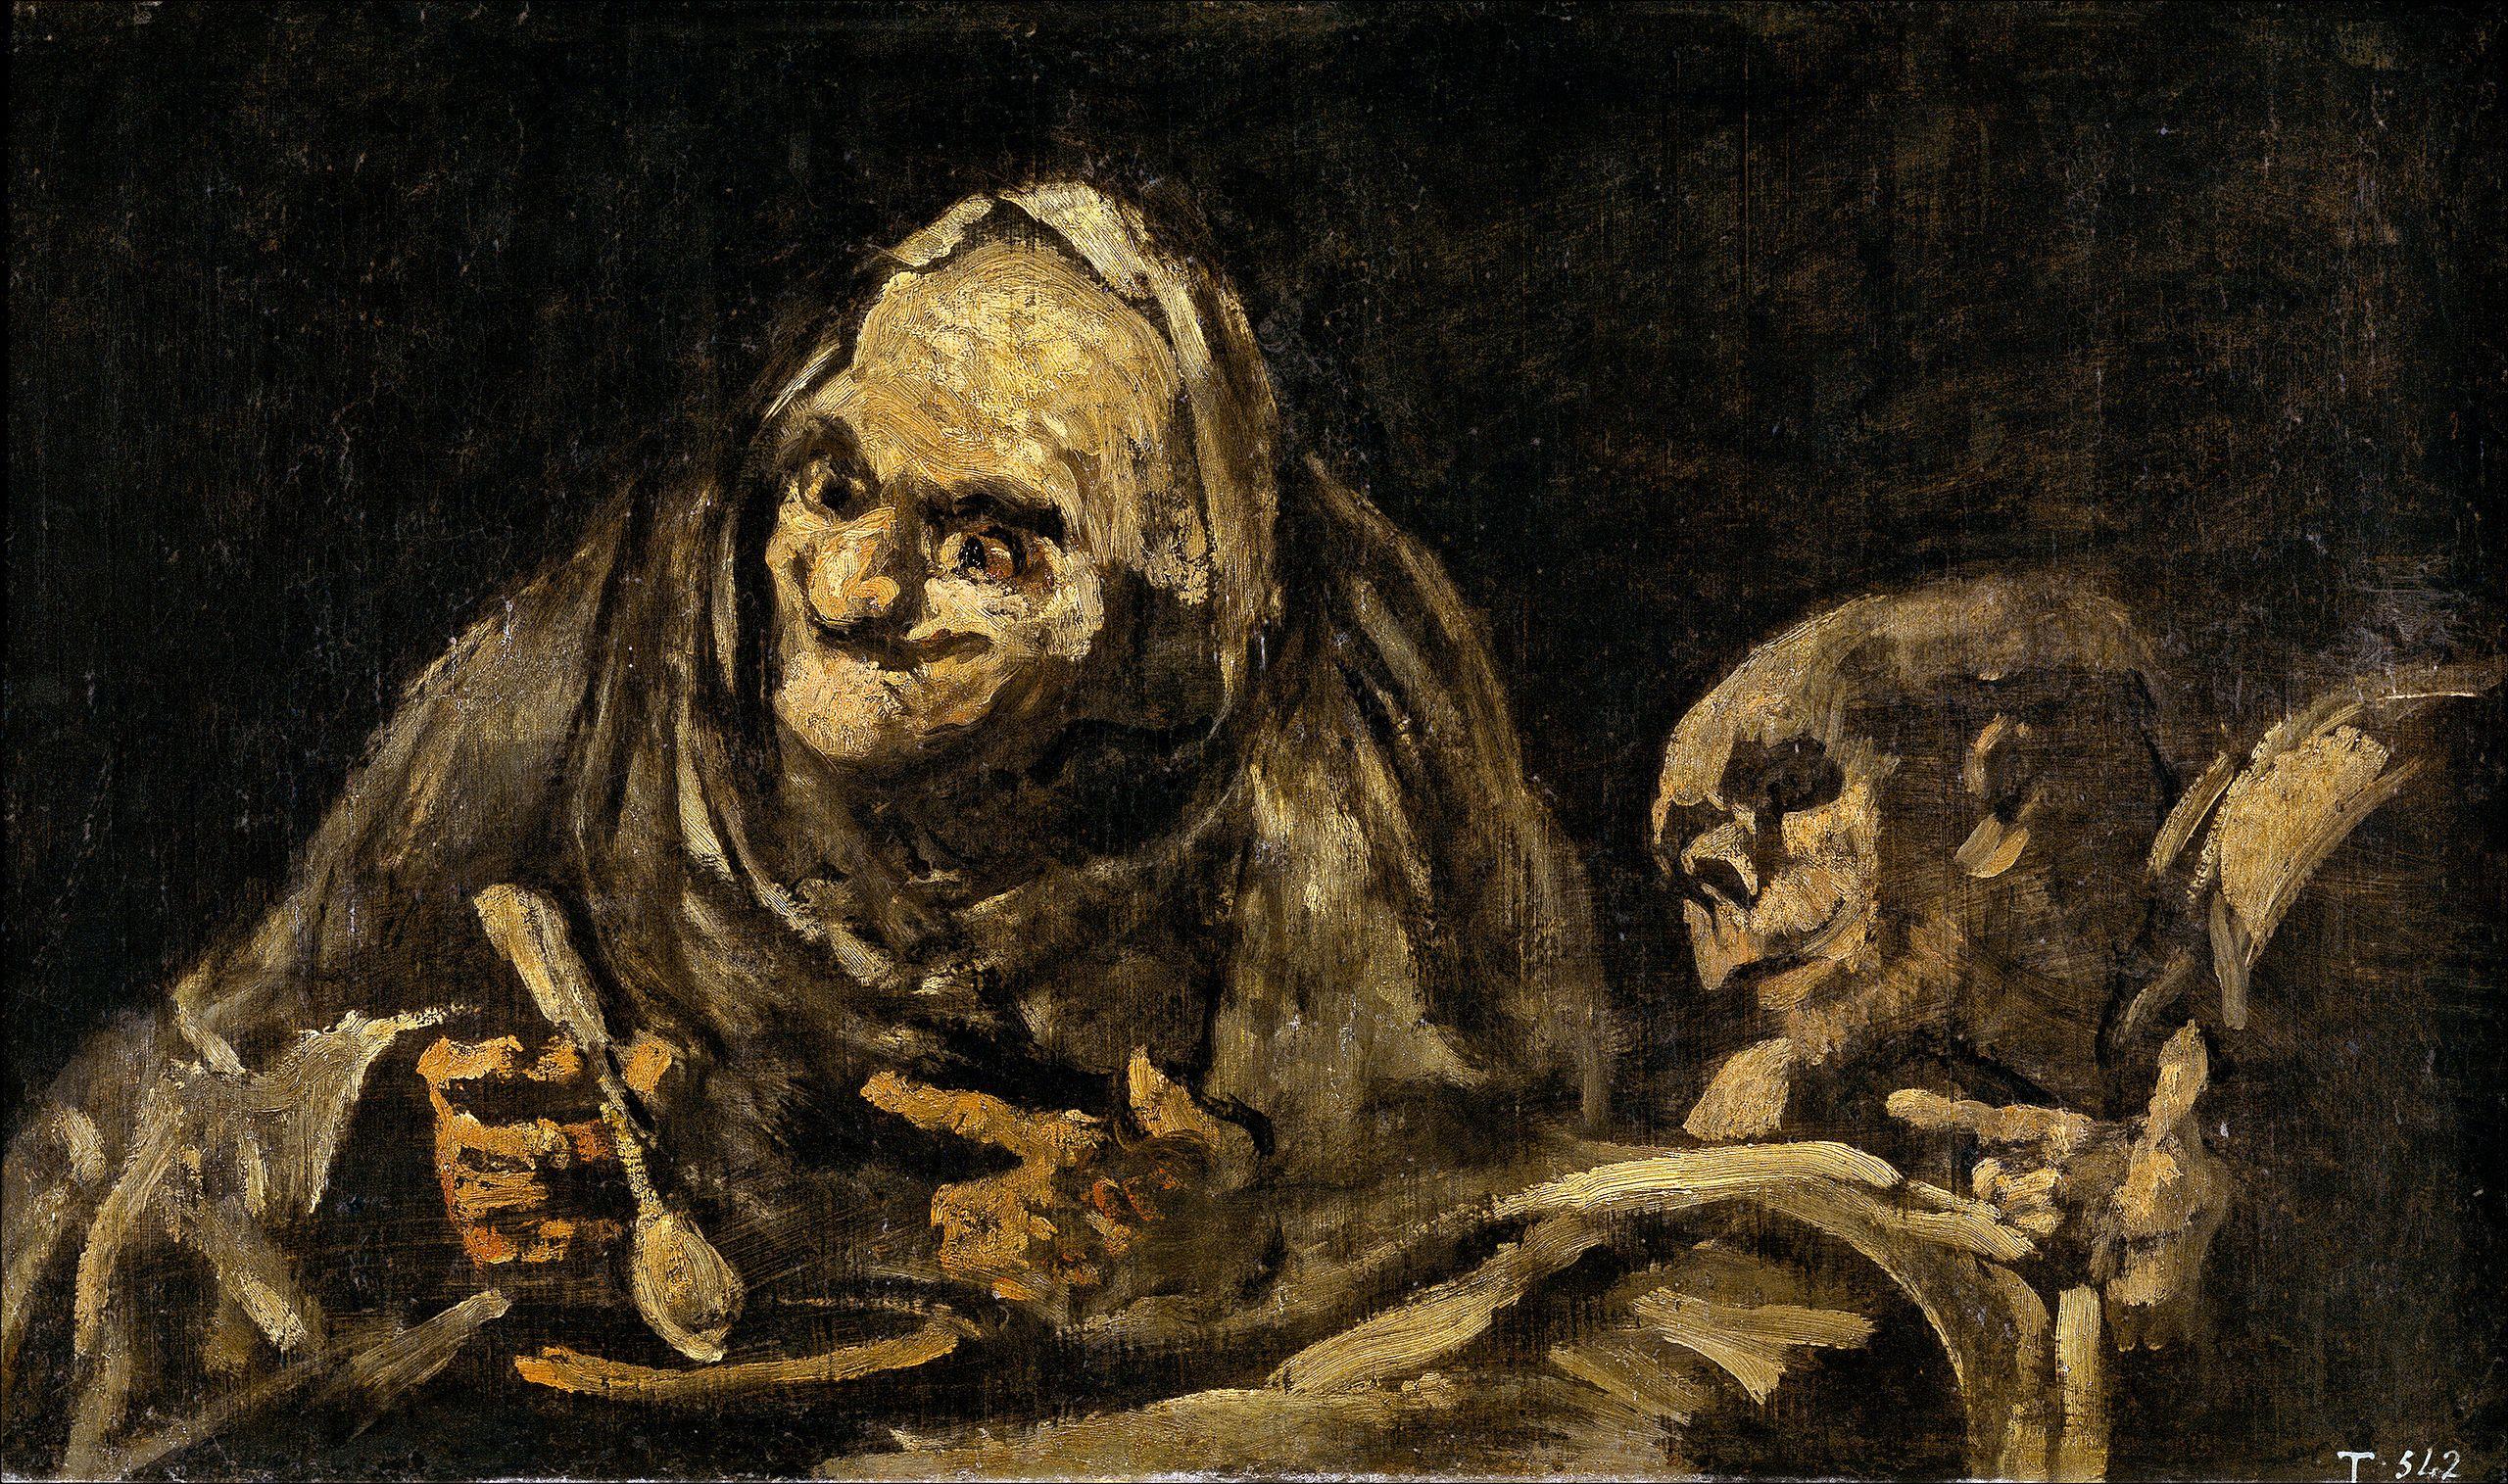 Viejos Comiendo Sopa Black Paintings Wikipedia The Free